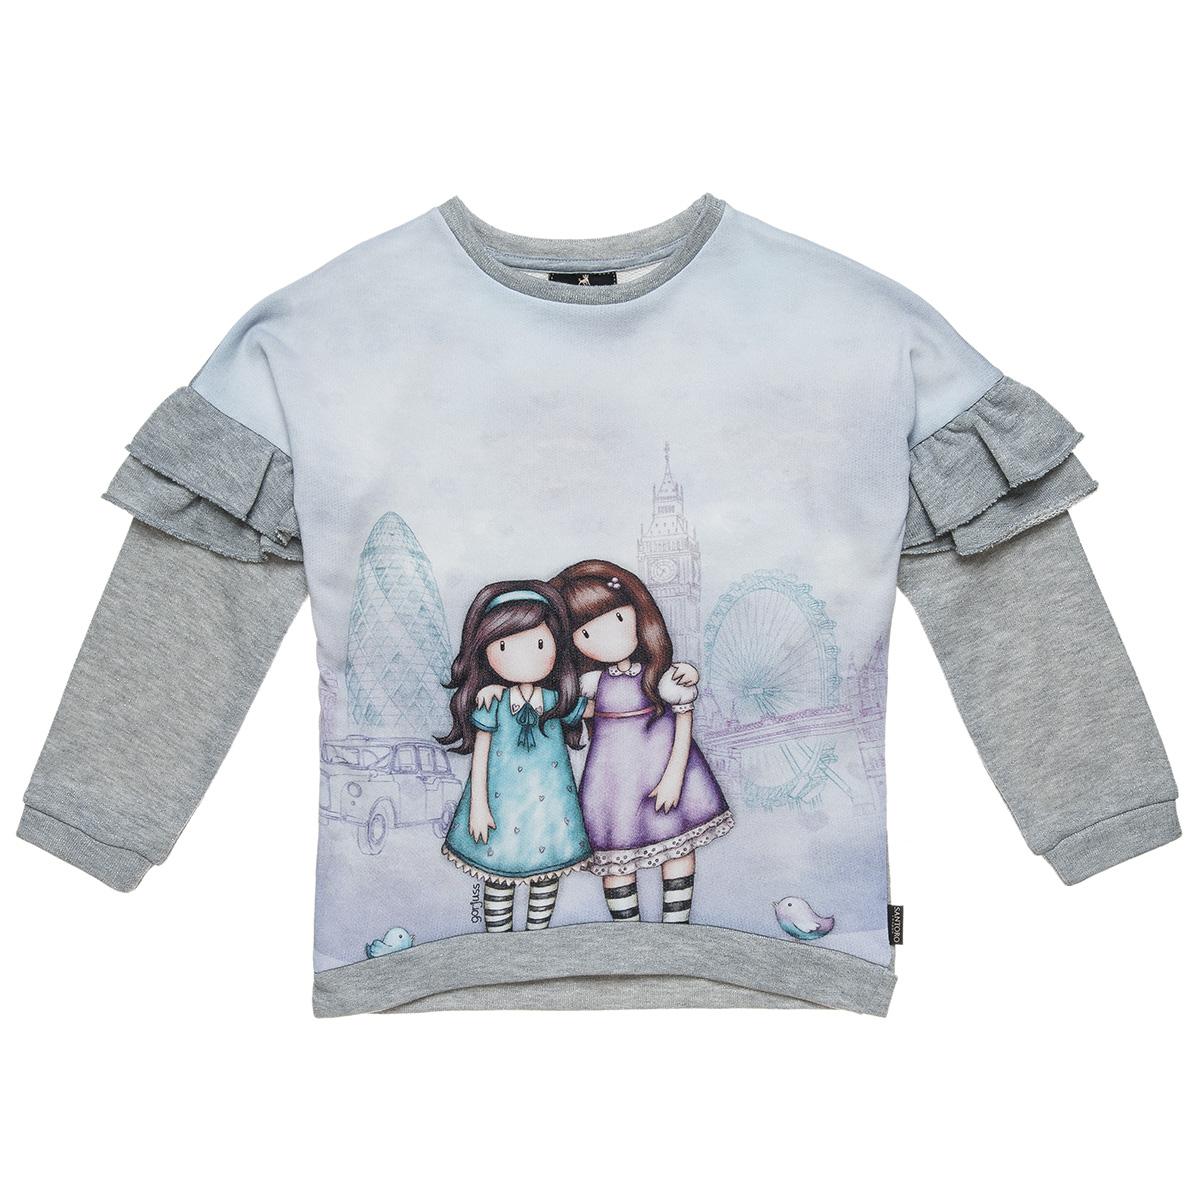 4f41eae8101 Μπλούζα Santoro με τύπωμα και βολάν (Κορίτσι 6-14 ετών) 00121357 - ΓΚΡΙ